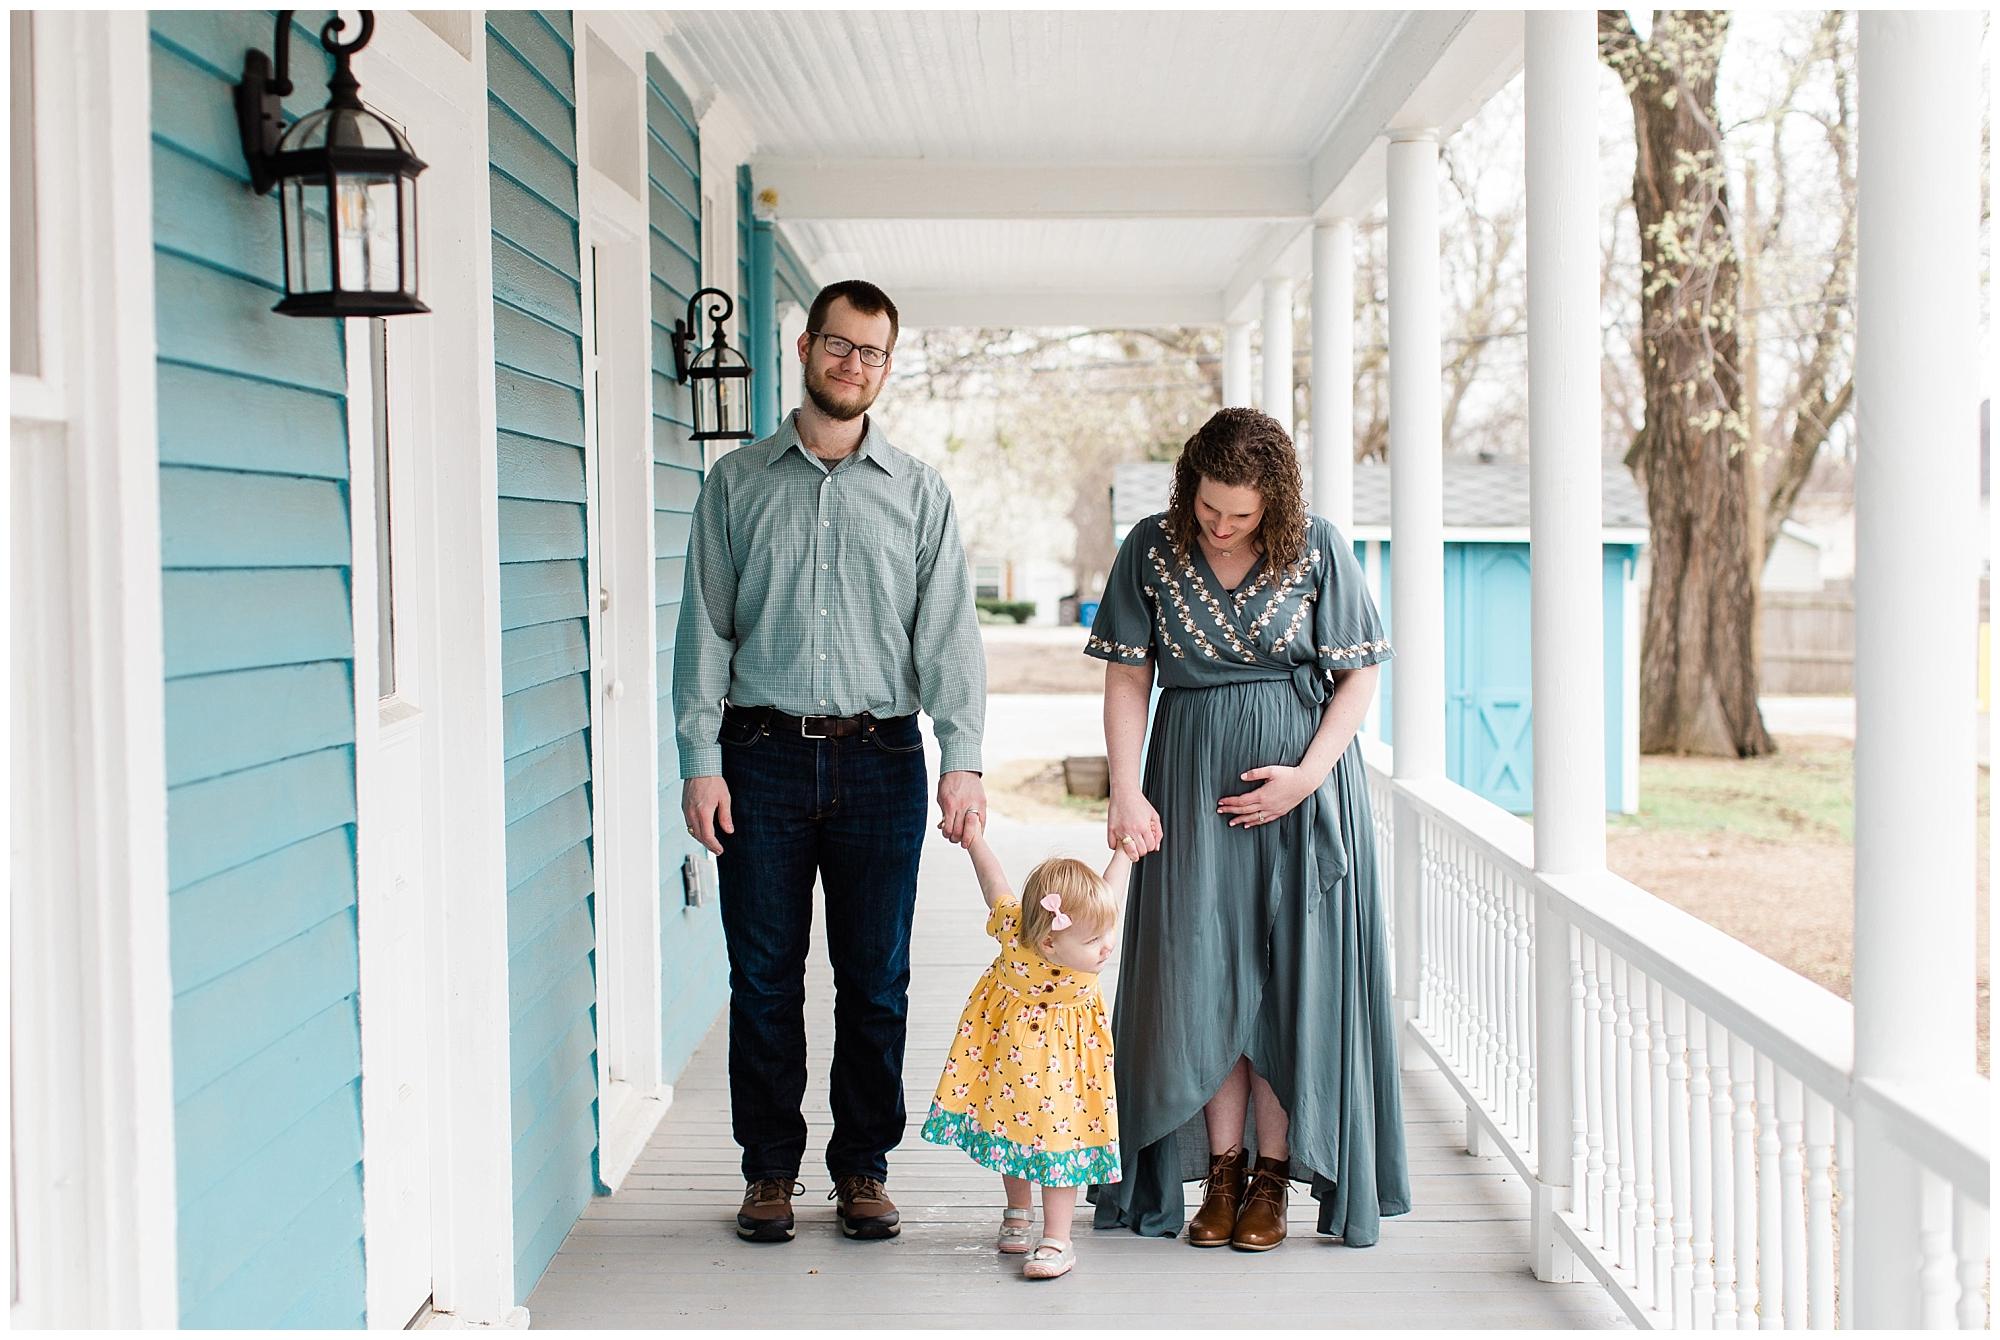 Dallas_Maternity_Photographer_0001.jpg